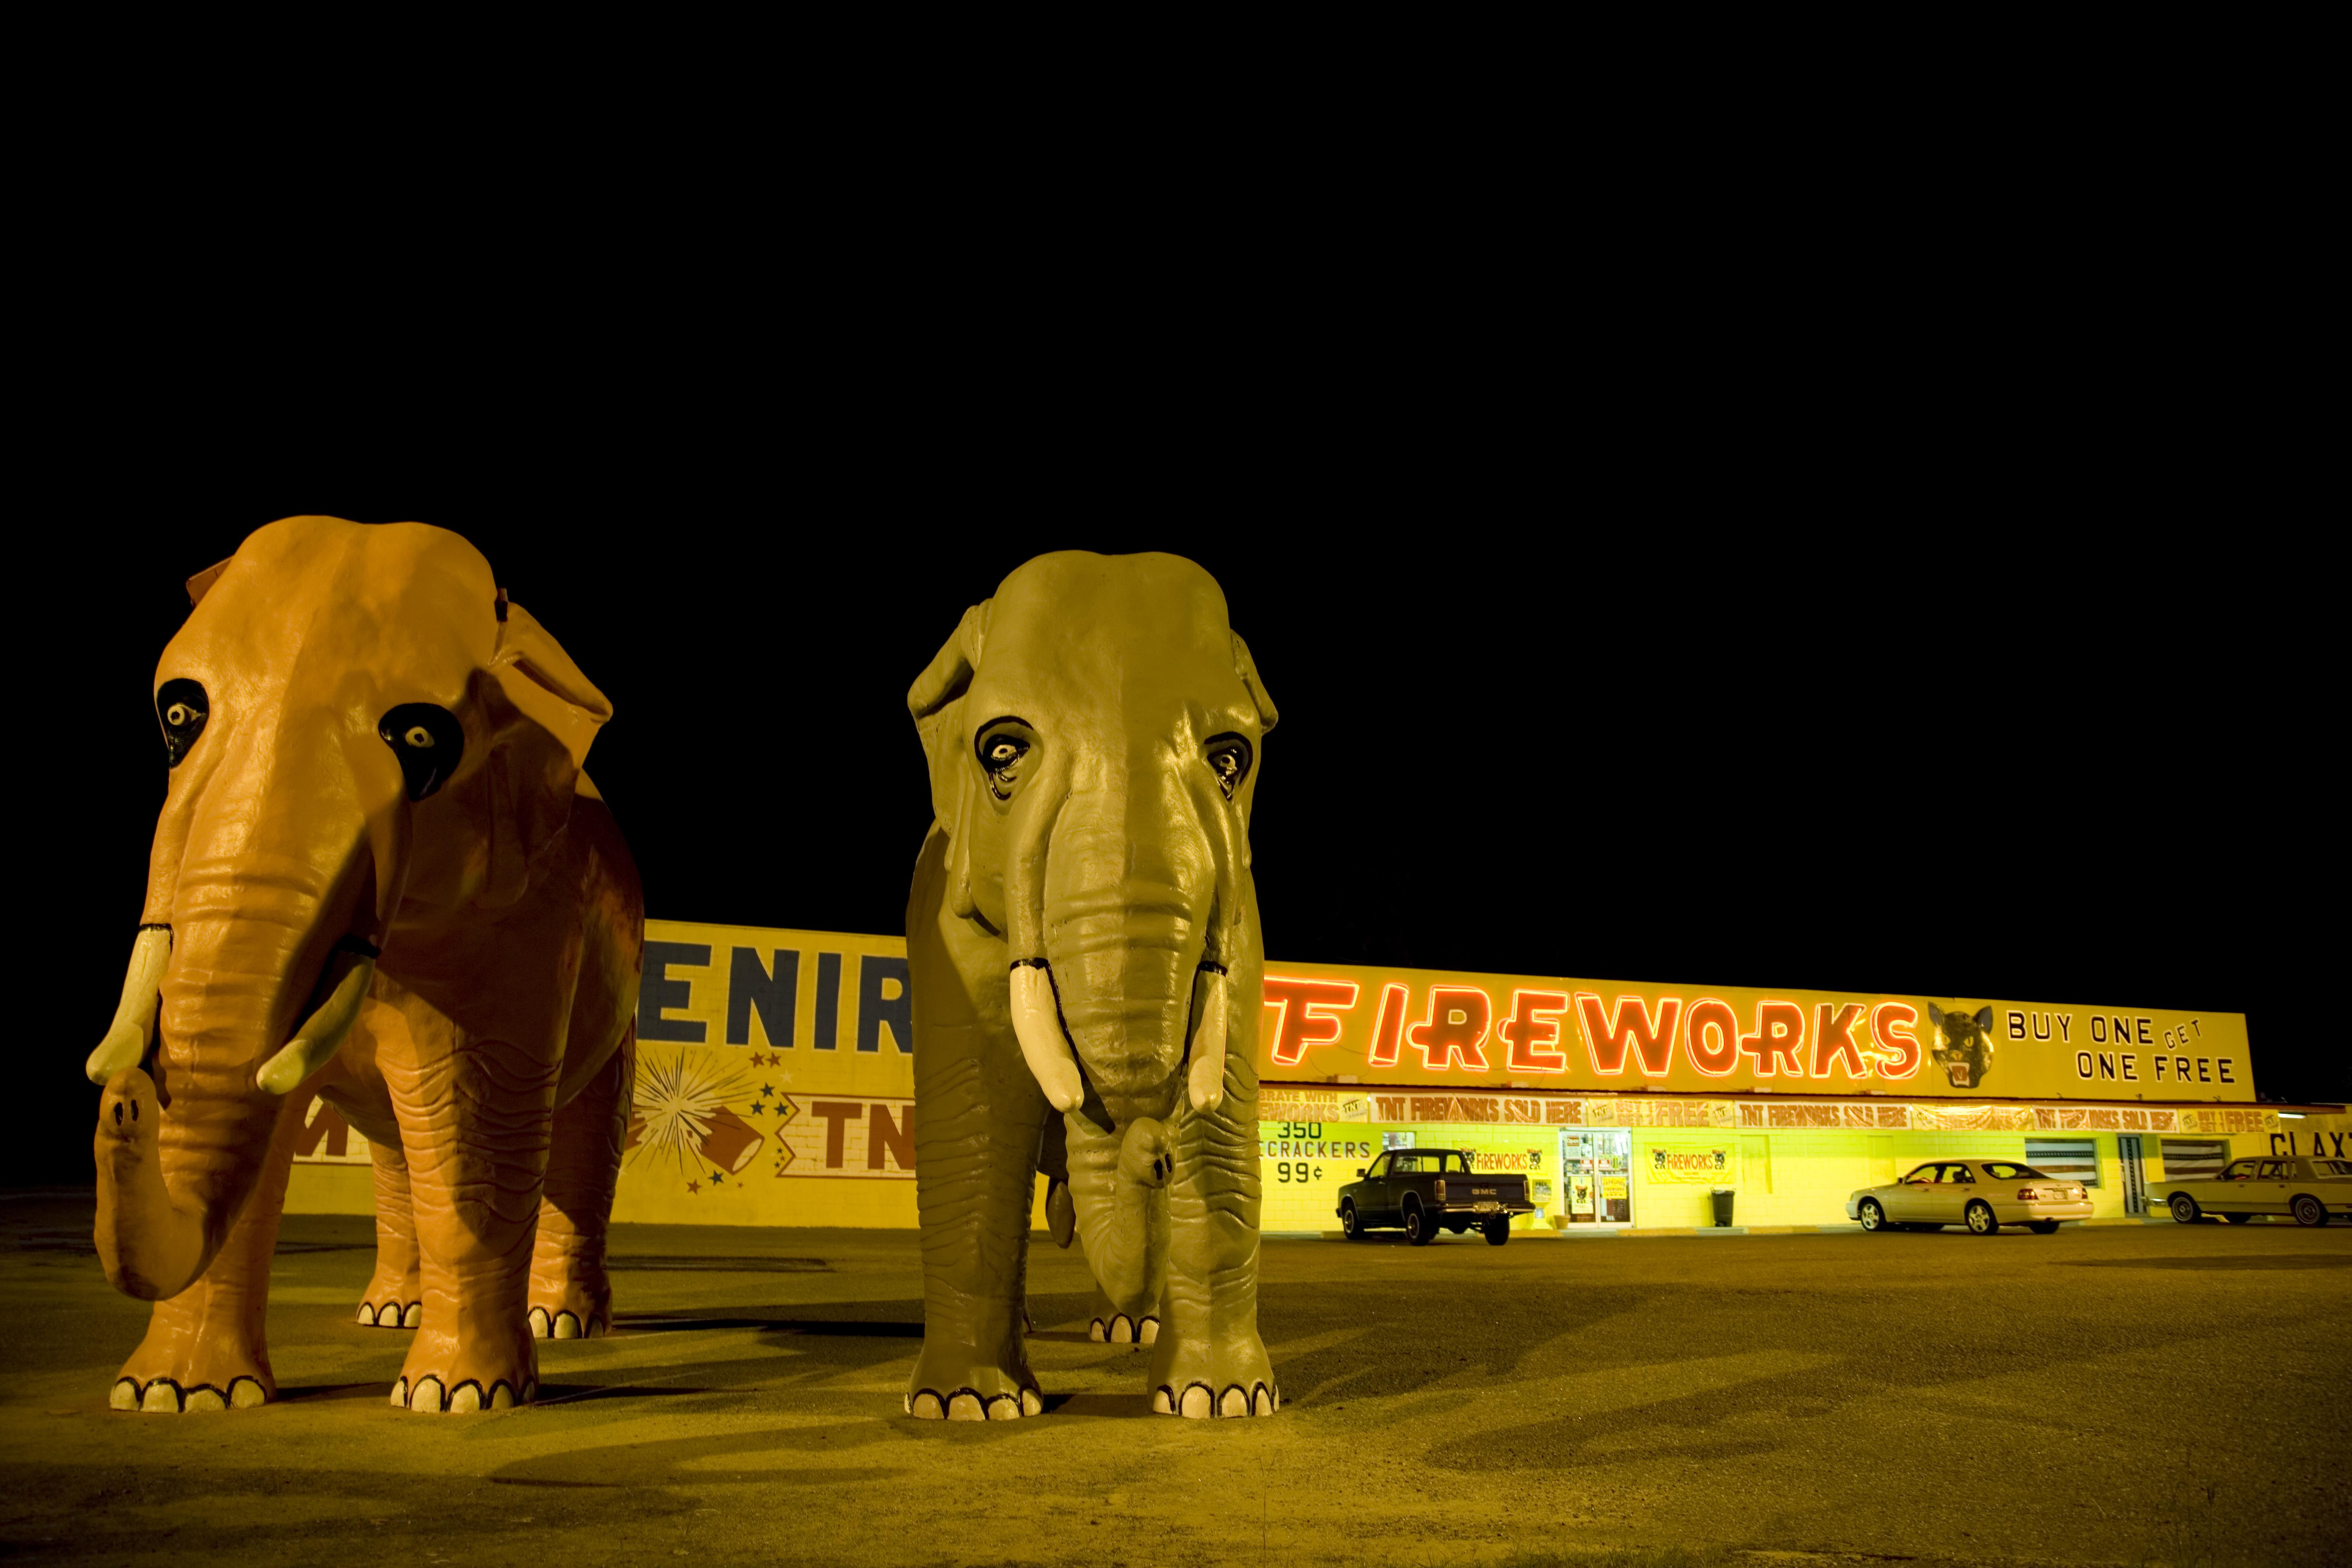 Georgia Fireworks Stand